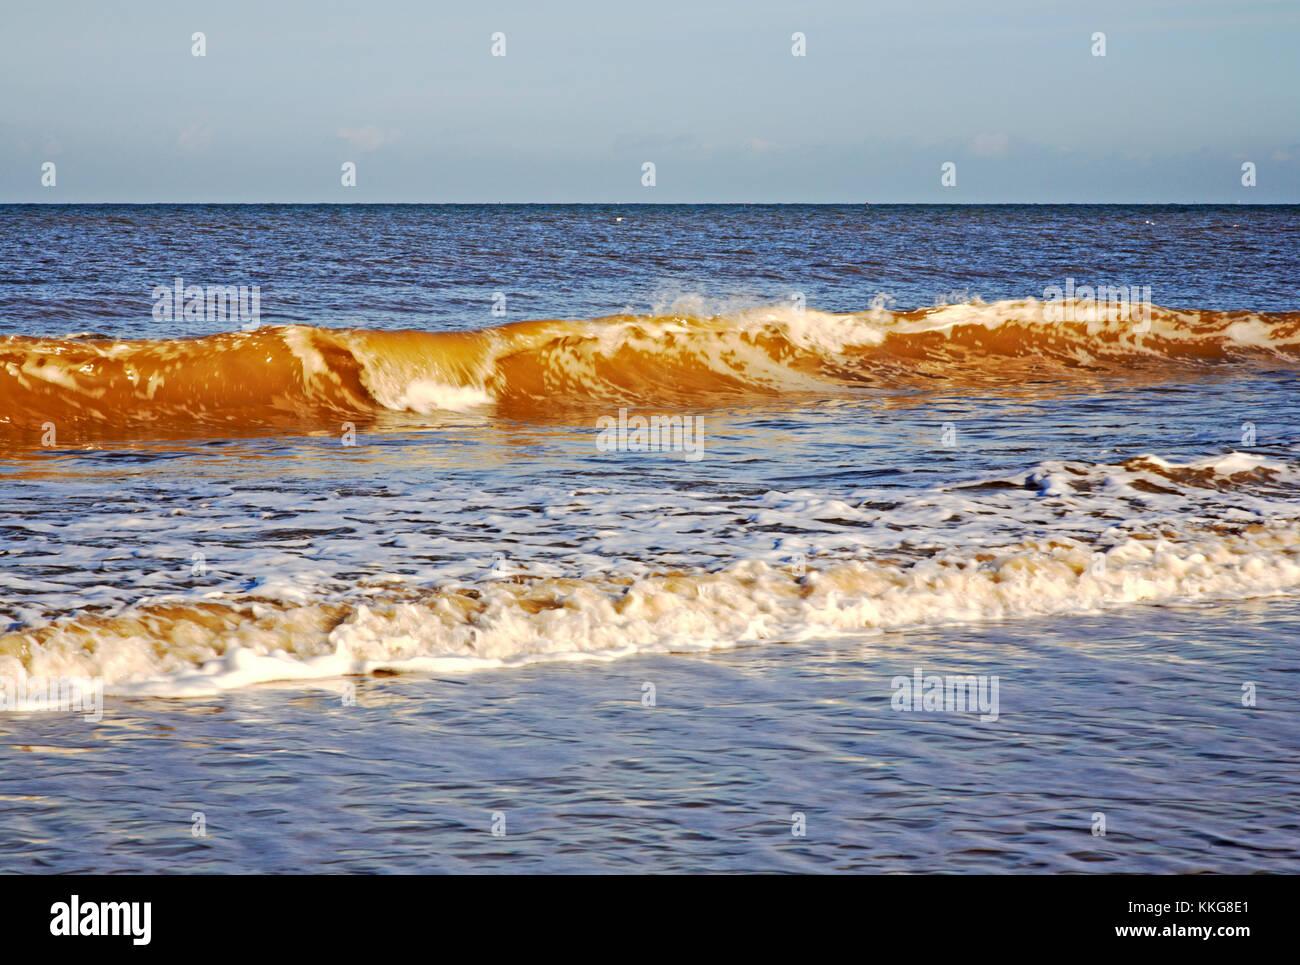 A breaking wave on the North Norfolk coast at East Runton, Norfolk, England, United Kingdom. - Stock Image